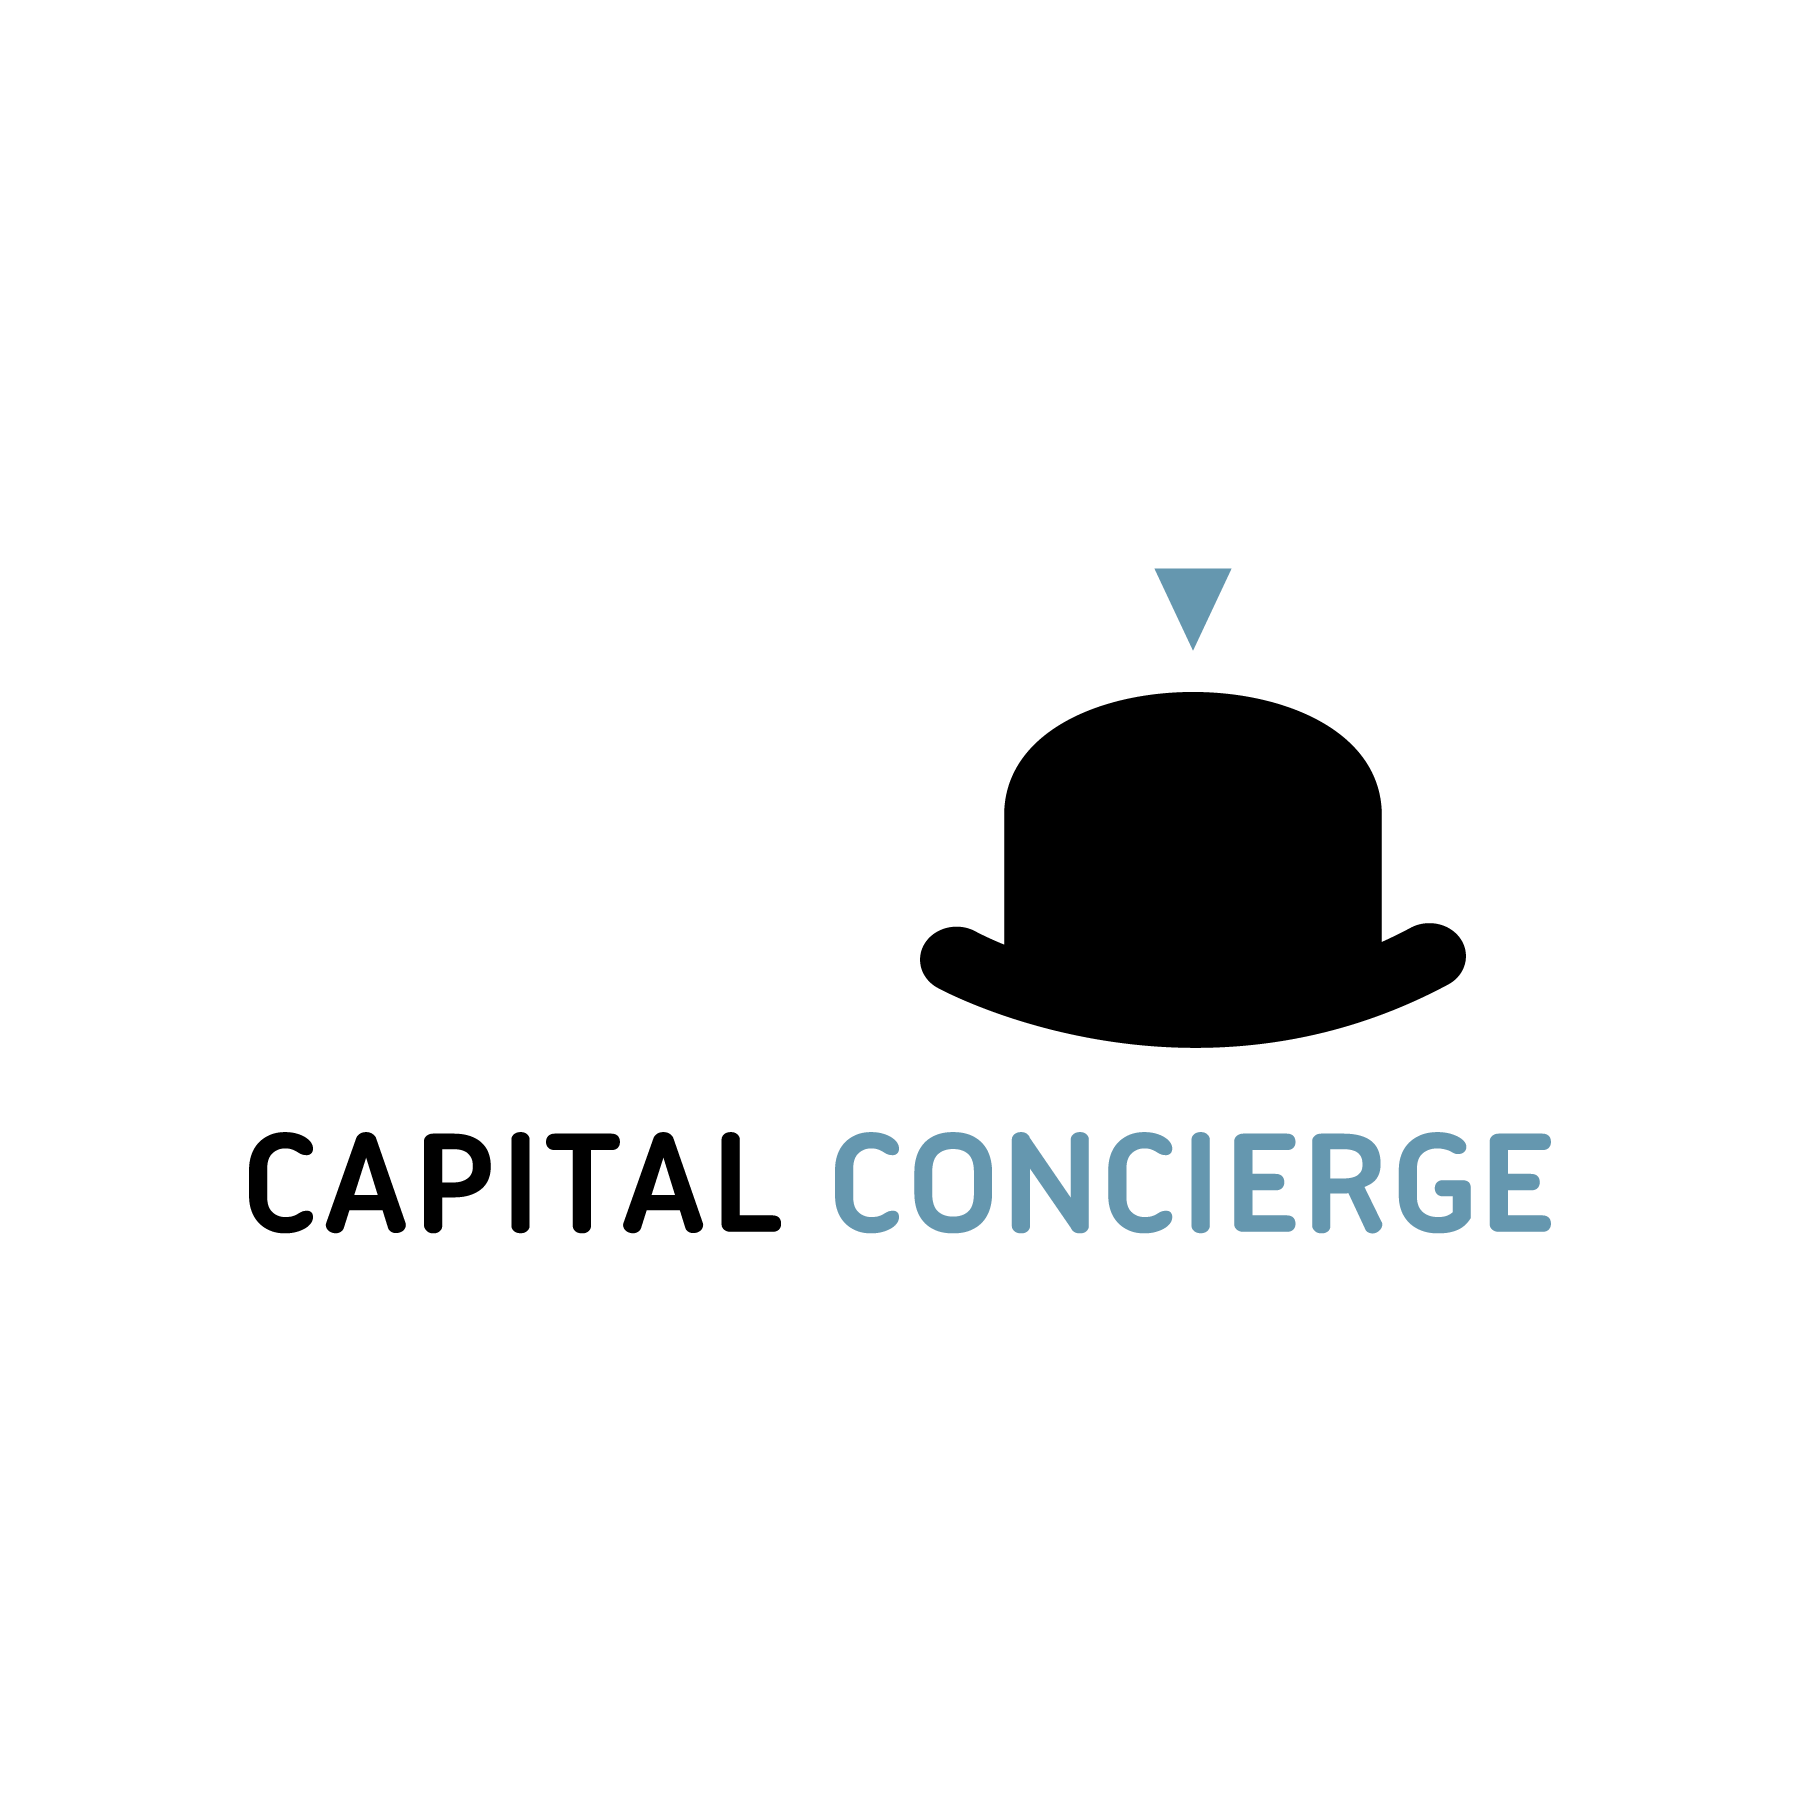 Capital Concierge